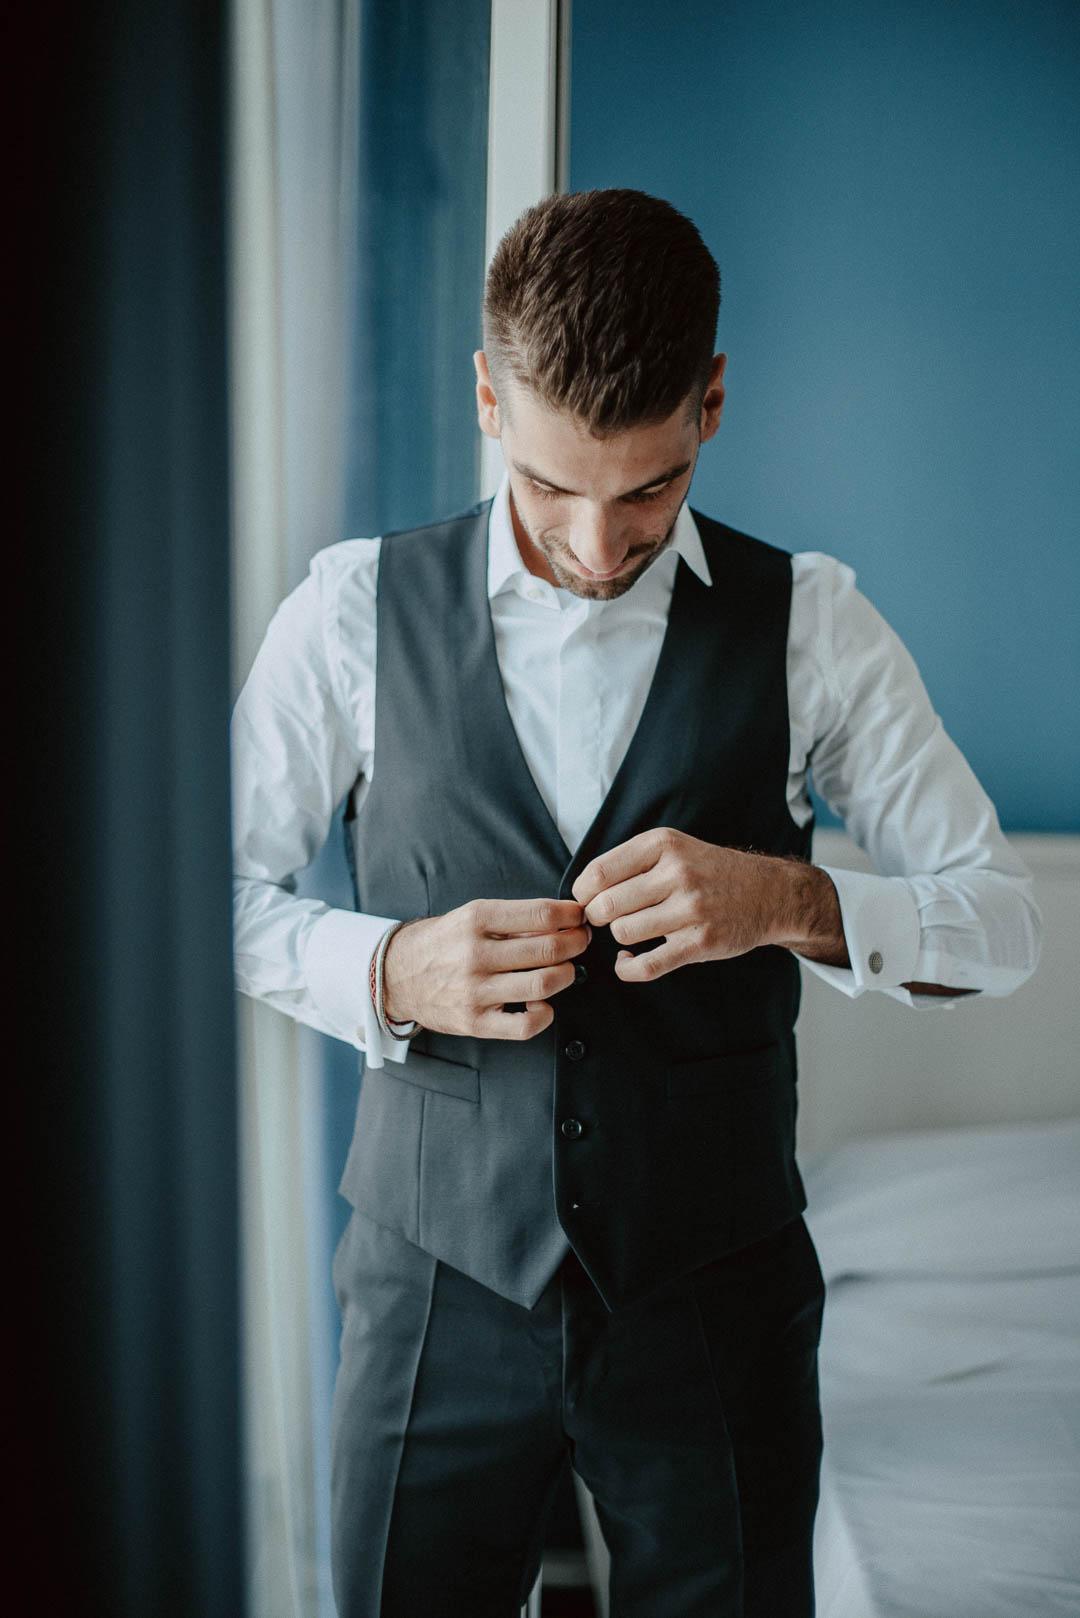 wedding-photographer-destination-fineart-bespoke-reportage-napoli-nabilah-vivianeizzo-spazio46-9